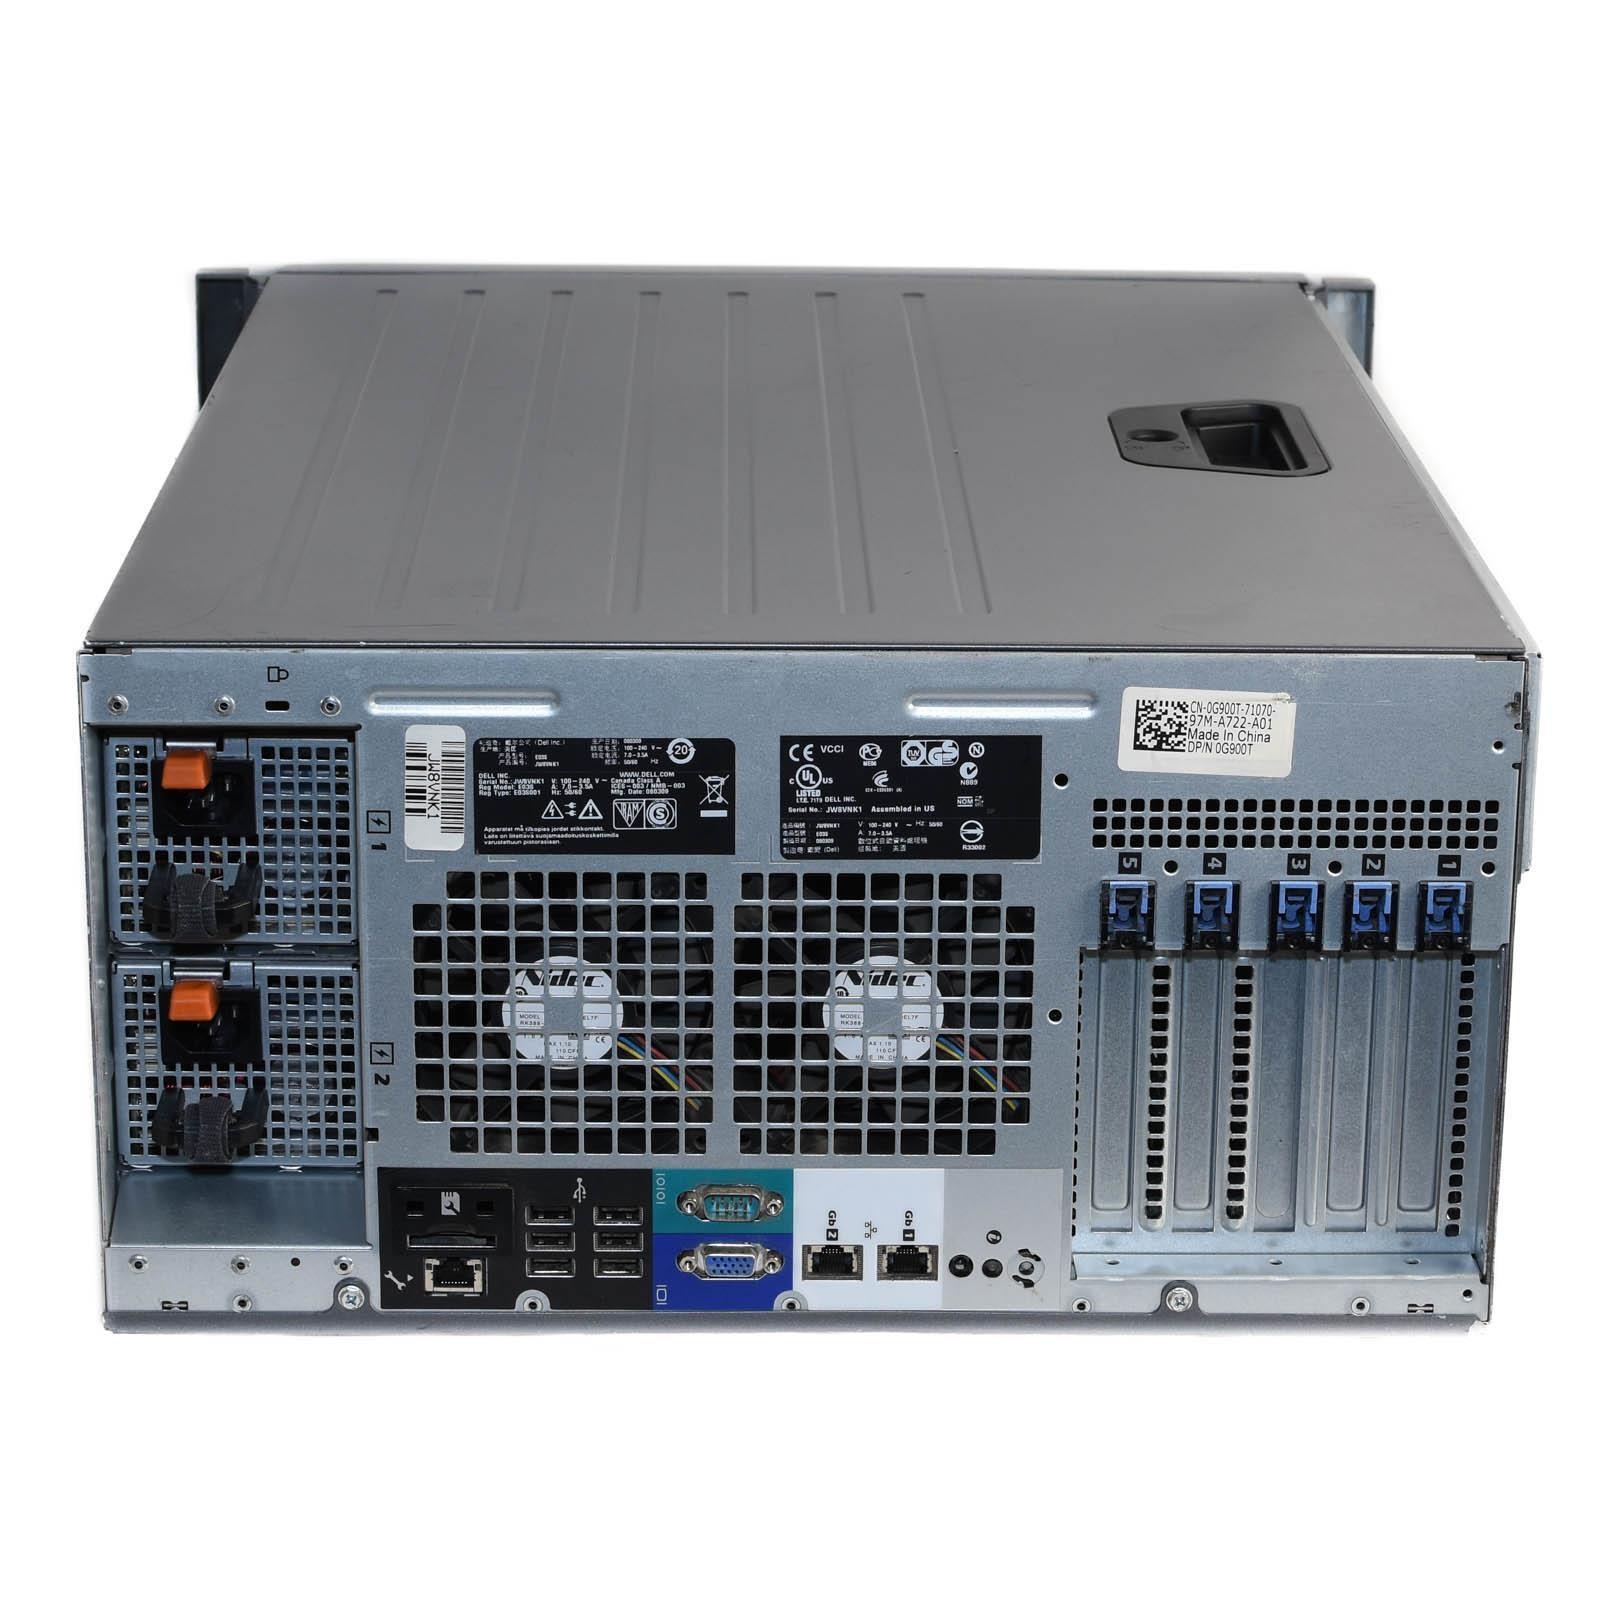 Dell PowerEdge T610 3 5